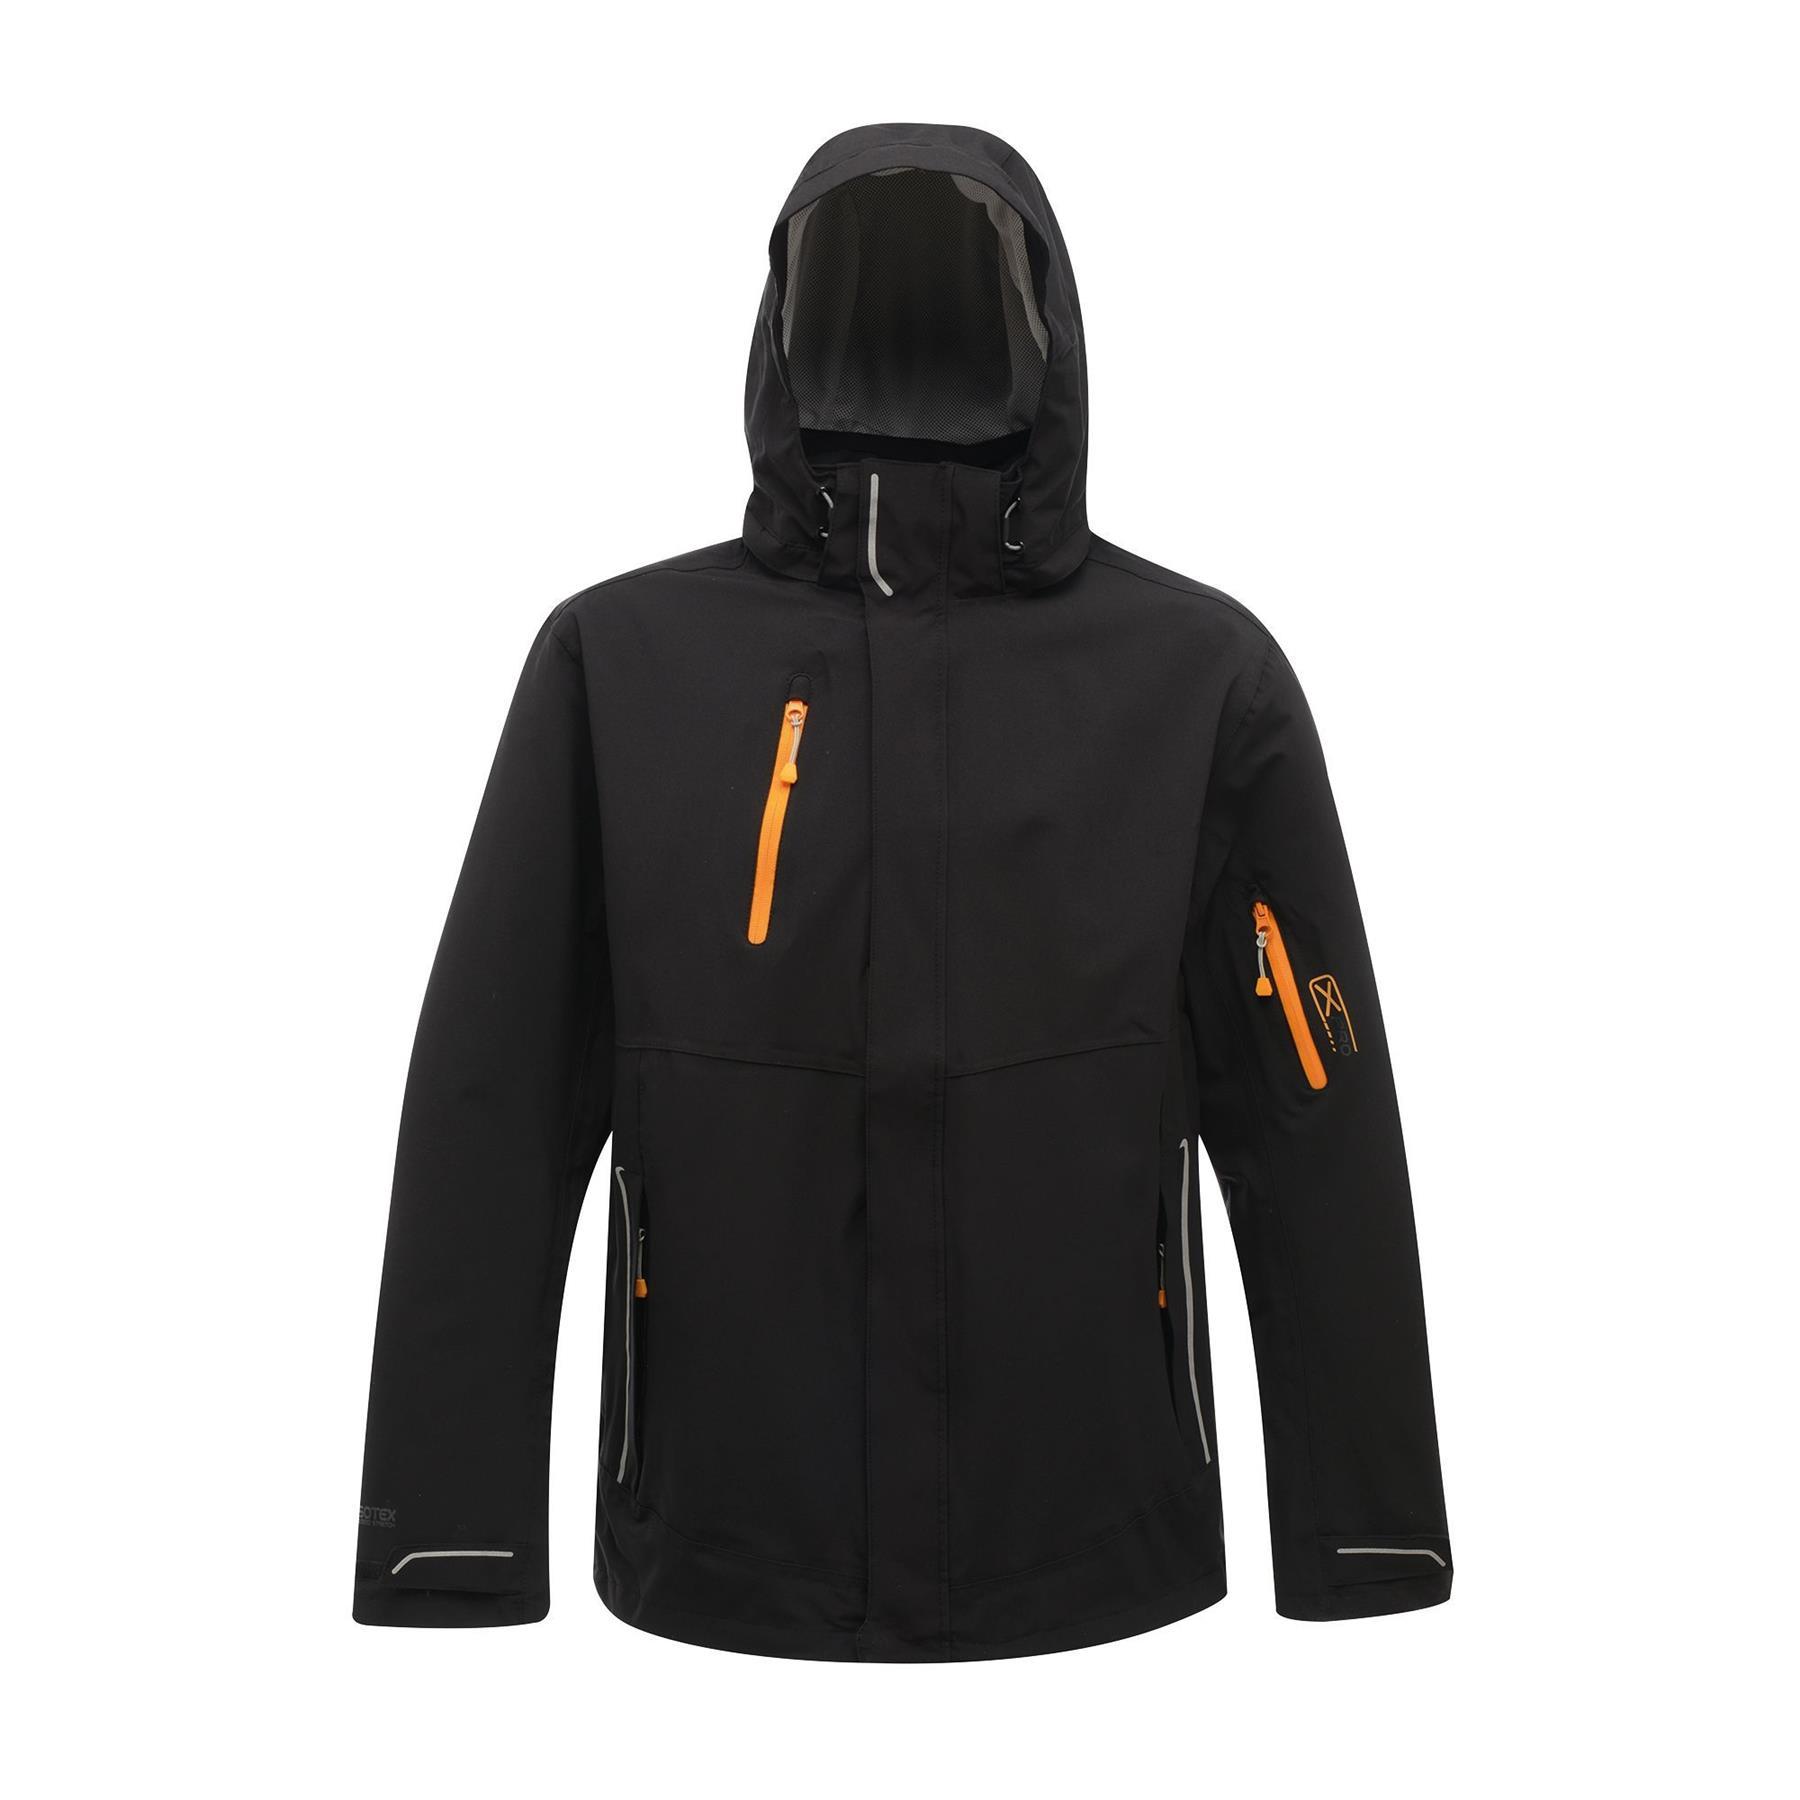 miniatuur 6 - Regatta Mens X-Pro Exosphere Stretch Waterproof Hooded Jacket